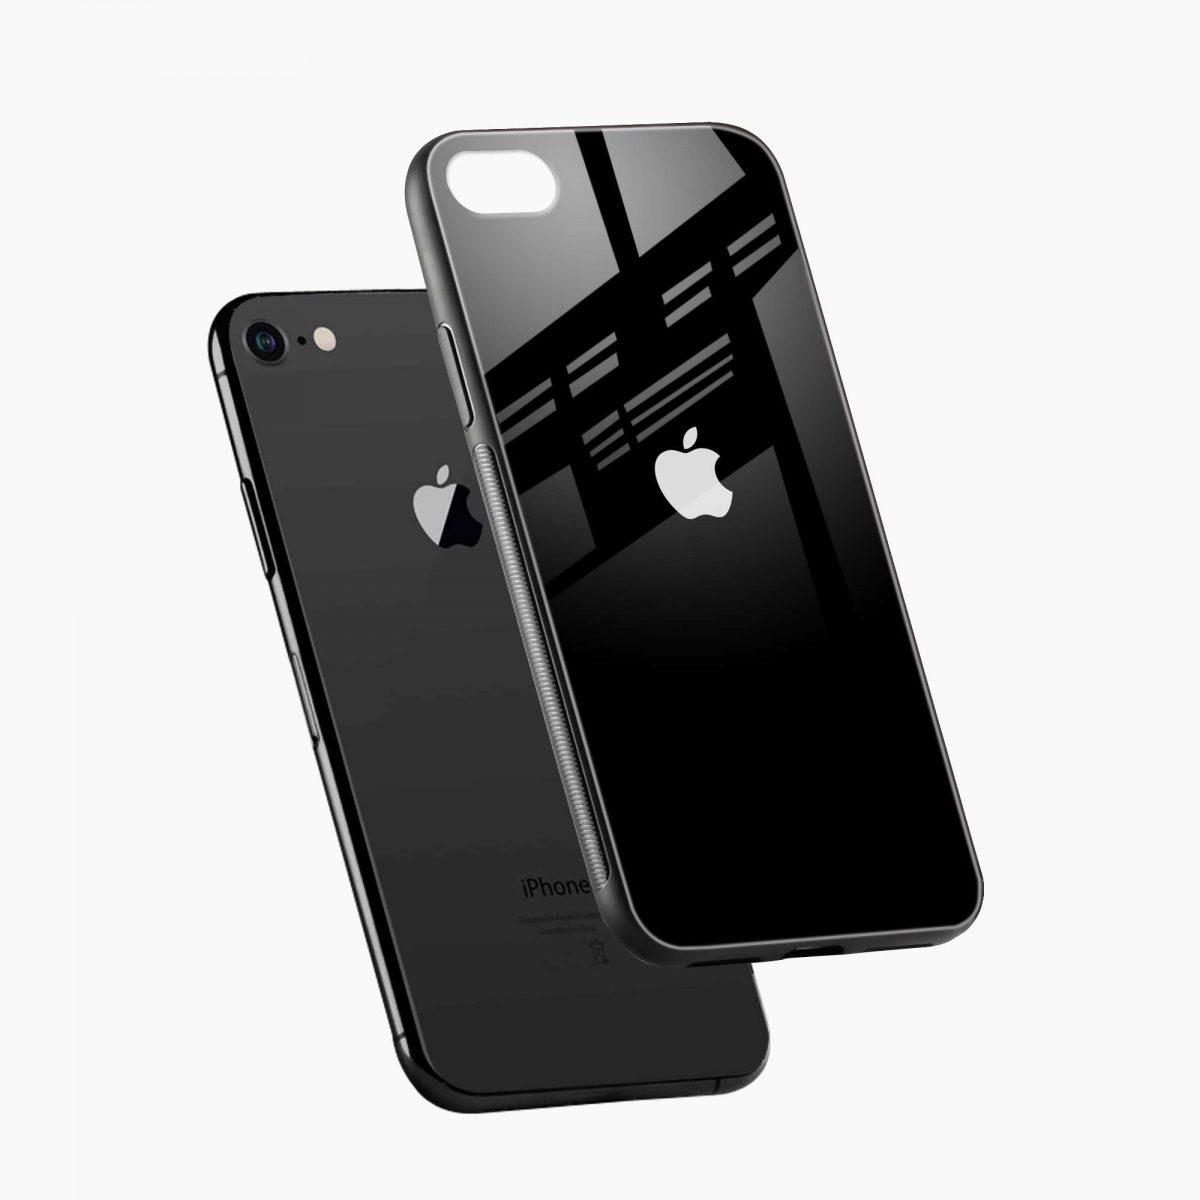 simply elegant diagonal view apple iphone 6 7 8 se back cover